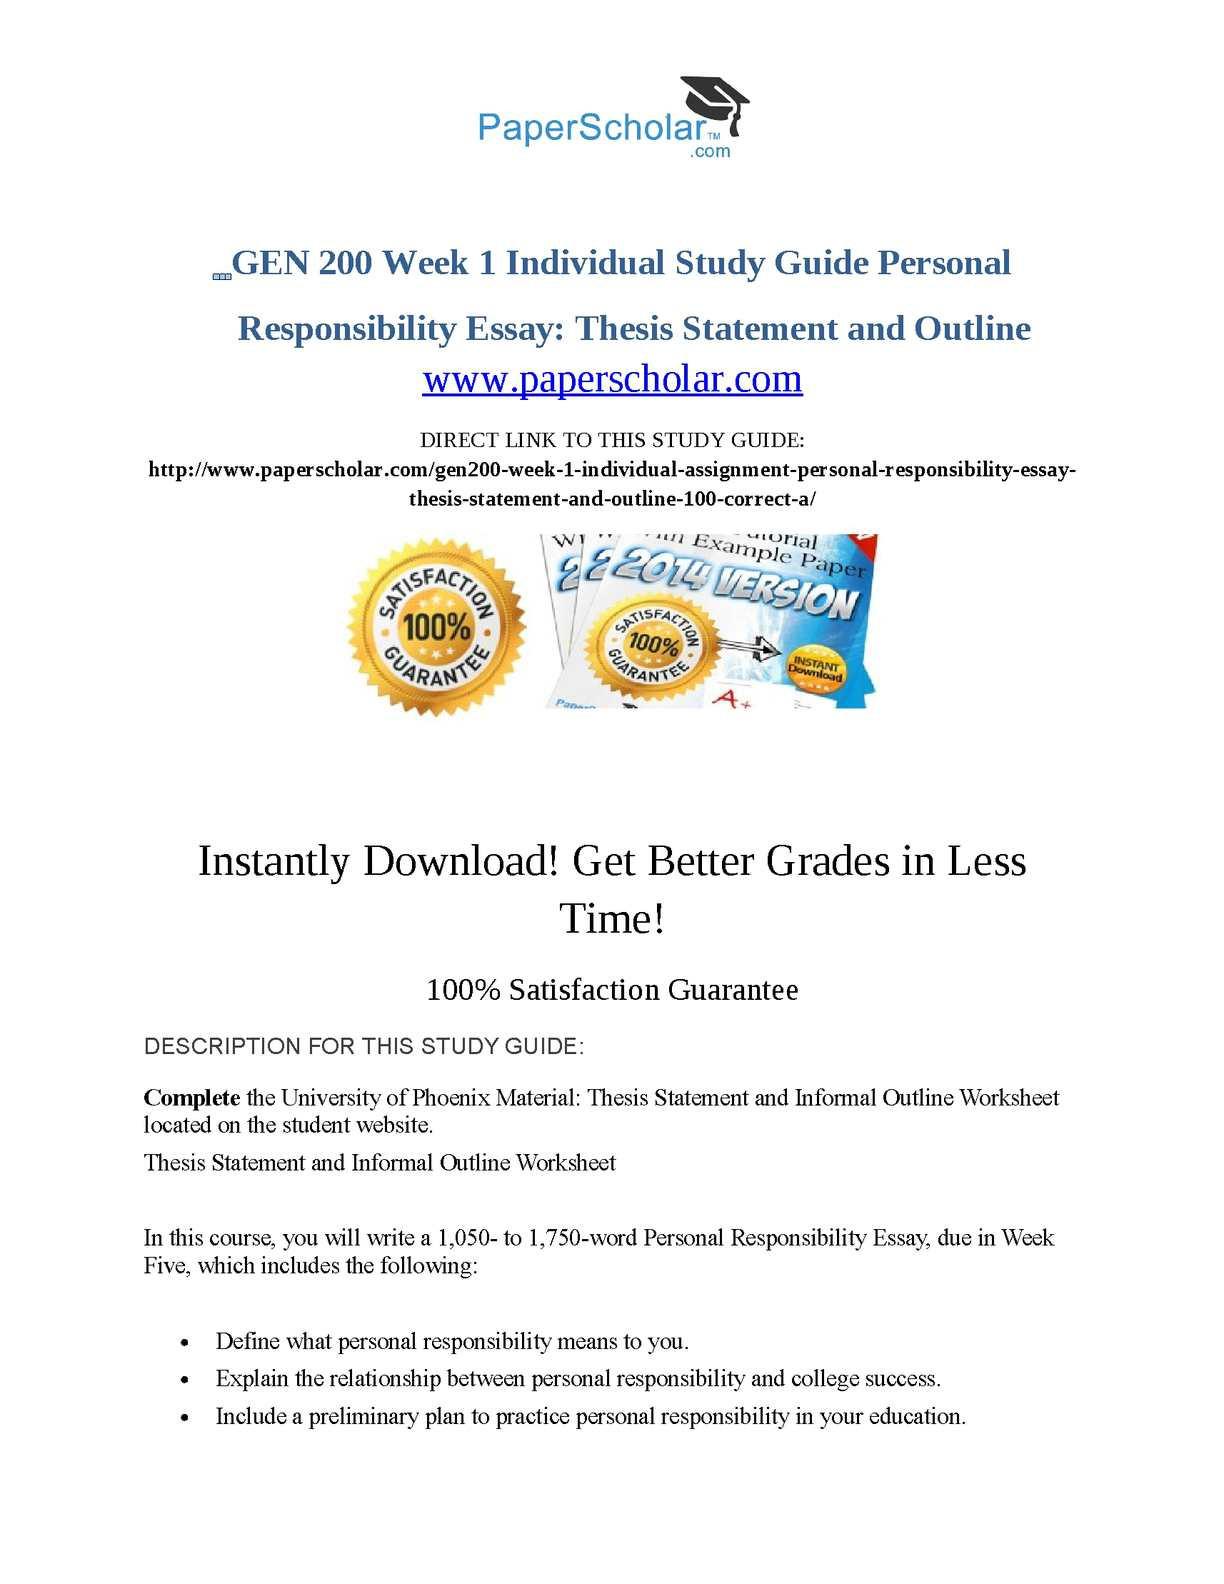 Thesis Statement Practice Worksheet Calaméo Gen 200 Week 1 Individual Study Guide Personal